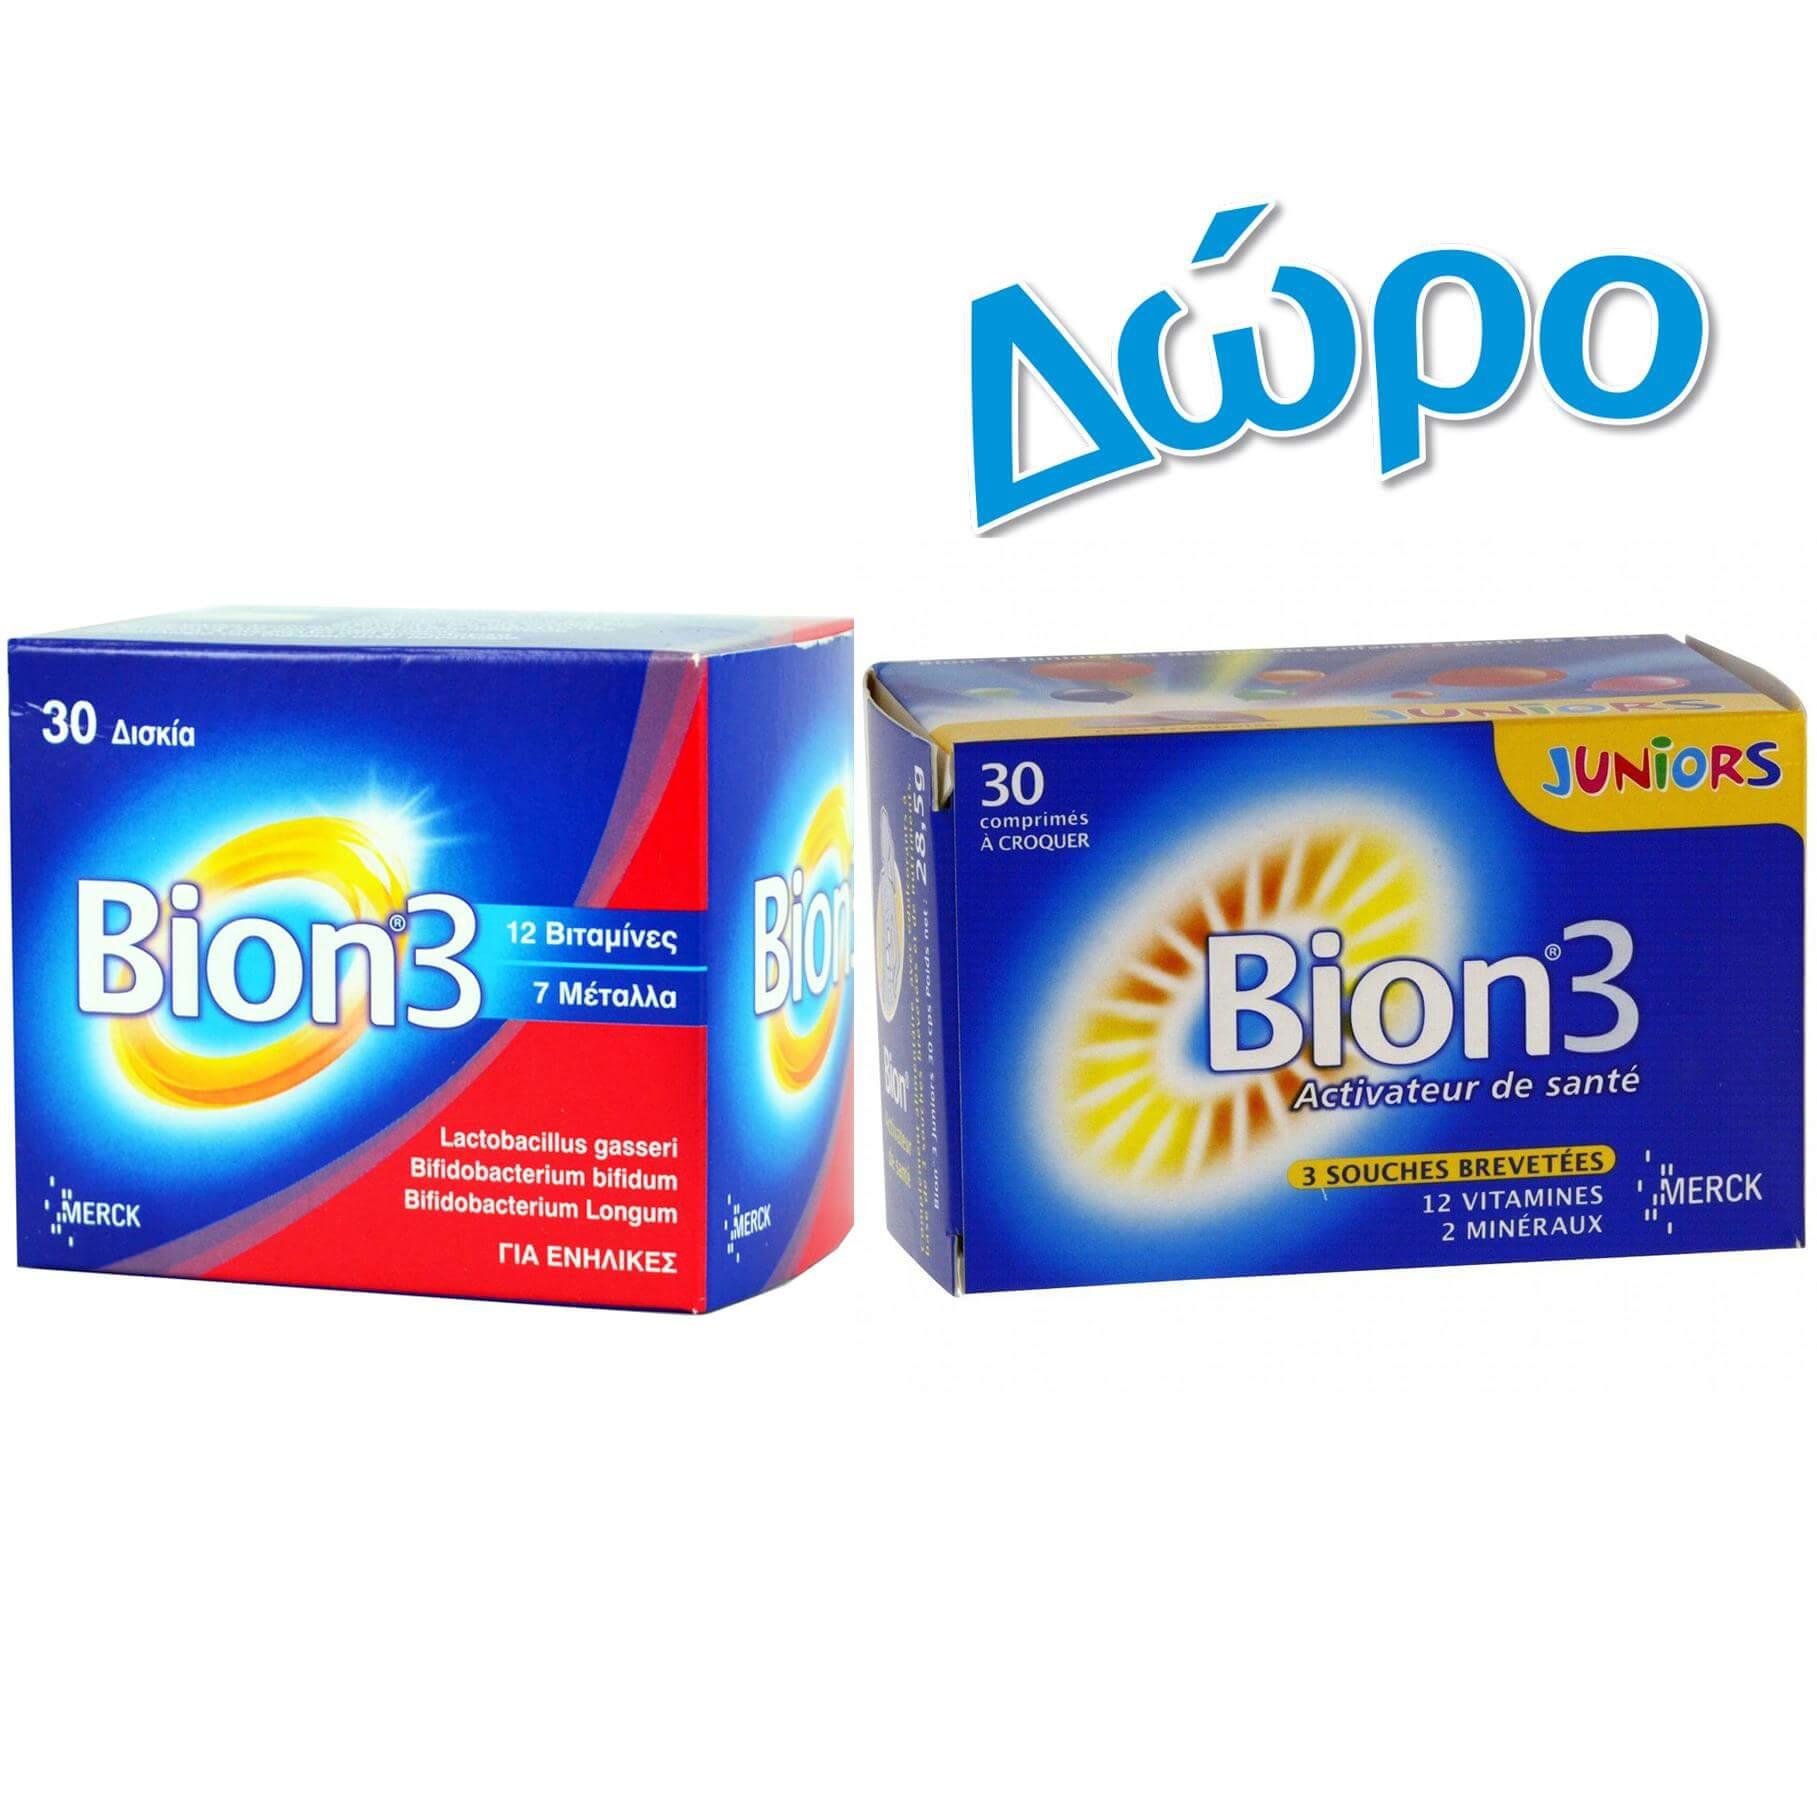 Bion 3 Πακέτο Προσφοράς Συμπλήρωμα Διατροφής για Ενήλικες με 12 Βιταμίνες & 7 Μέταλλα 30tabs & Δώρο Bion 3 Junior 30chew.tabs